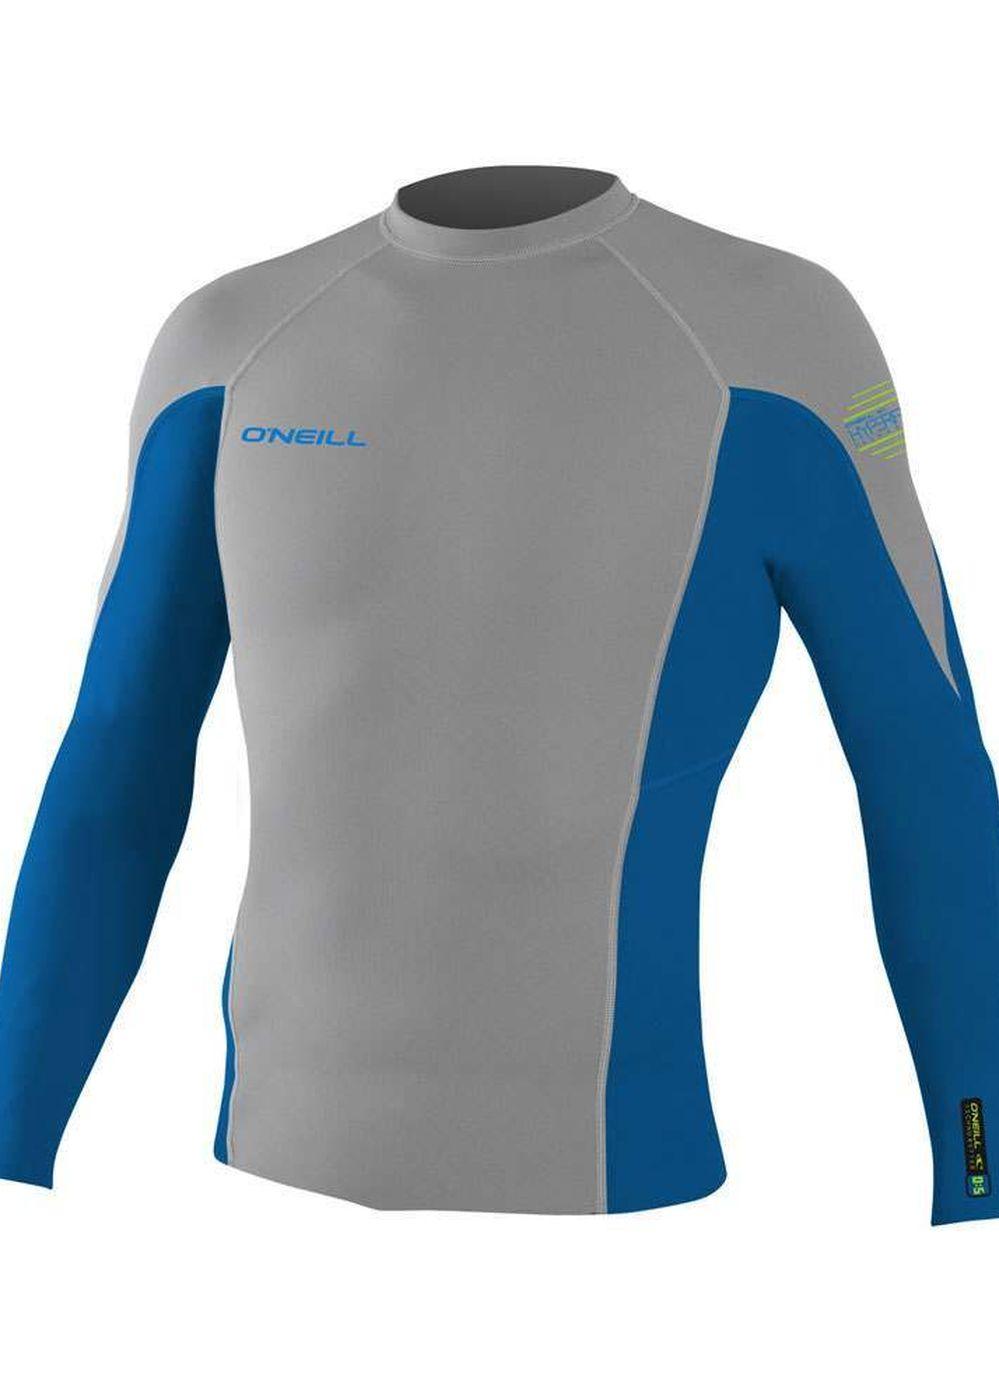 Oneill Hyperfreak 0.5mm Long Sleeve Wetsuit Top Lu Picture